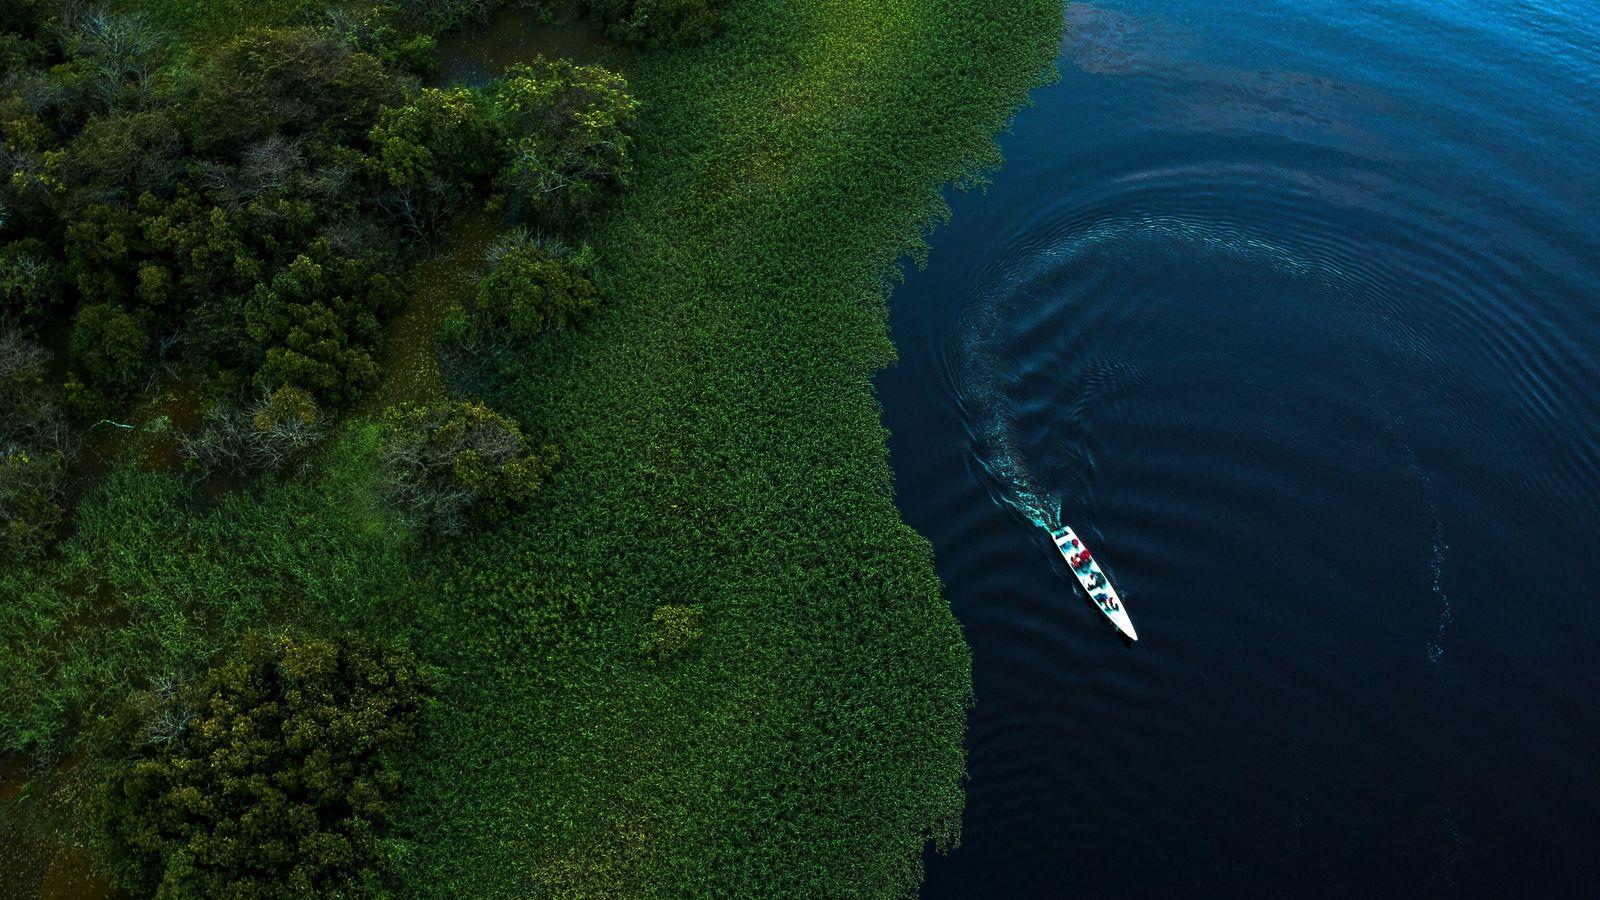 maciel-lake-amazon-sediment